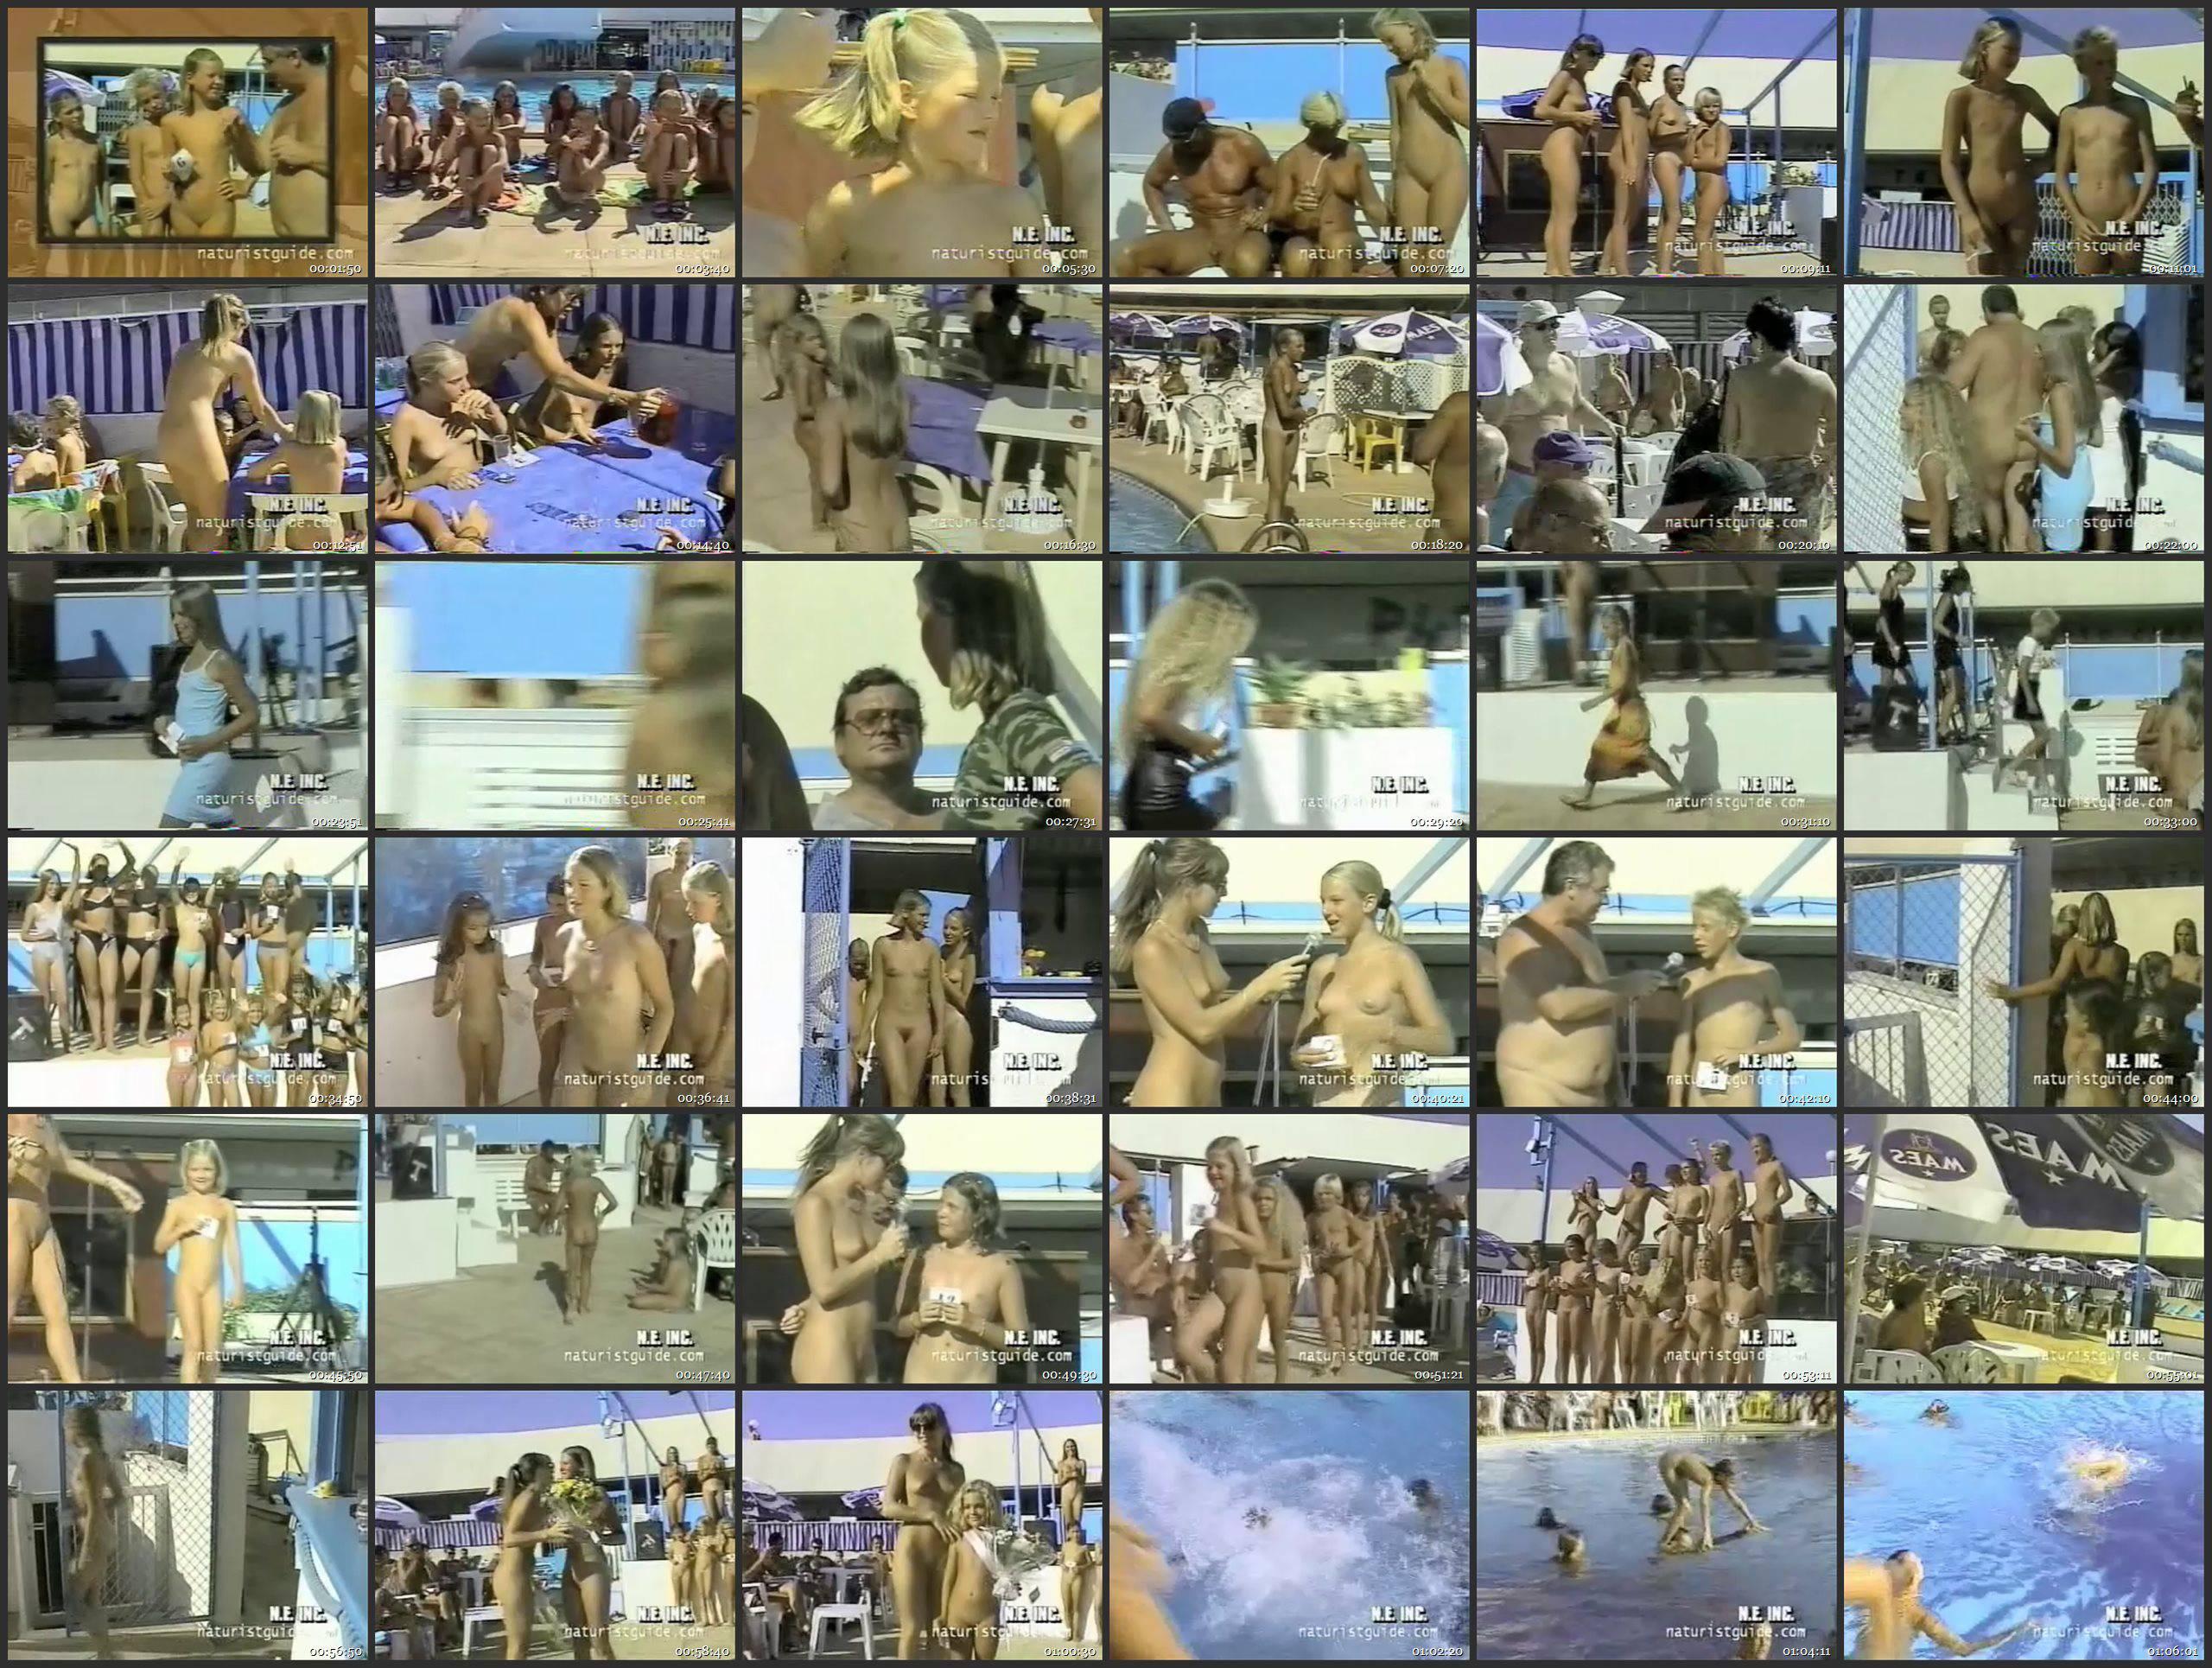 NudismProvider Junior Miss Pageant 1999 series Vol.3 - Thumbnails